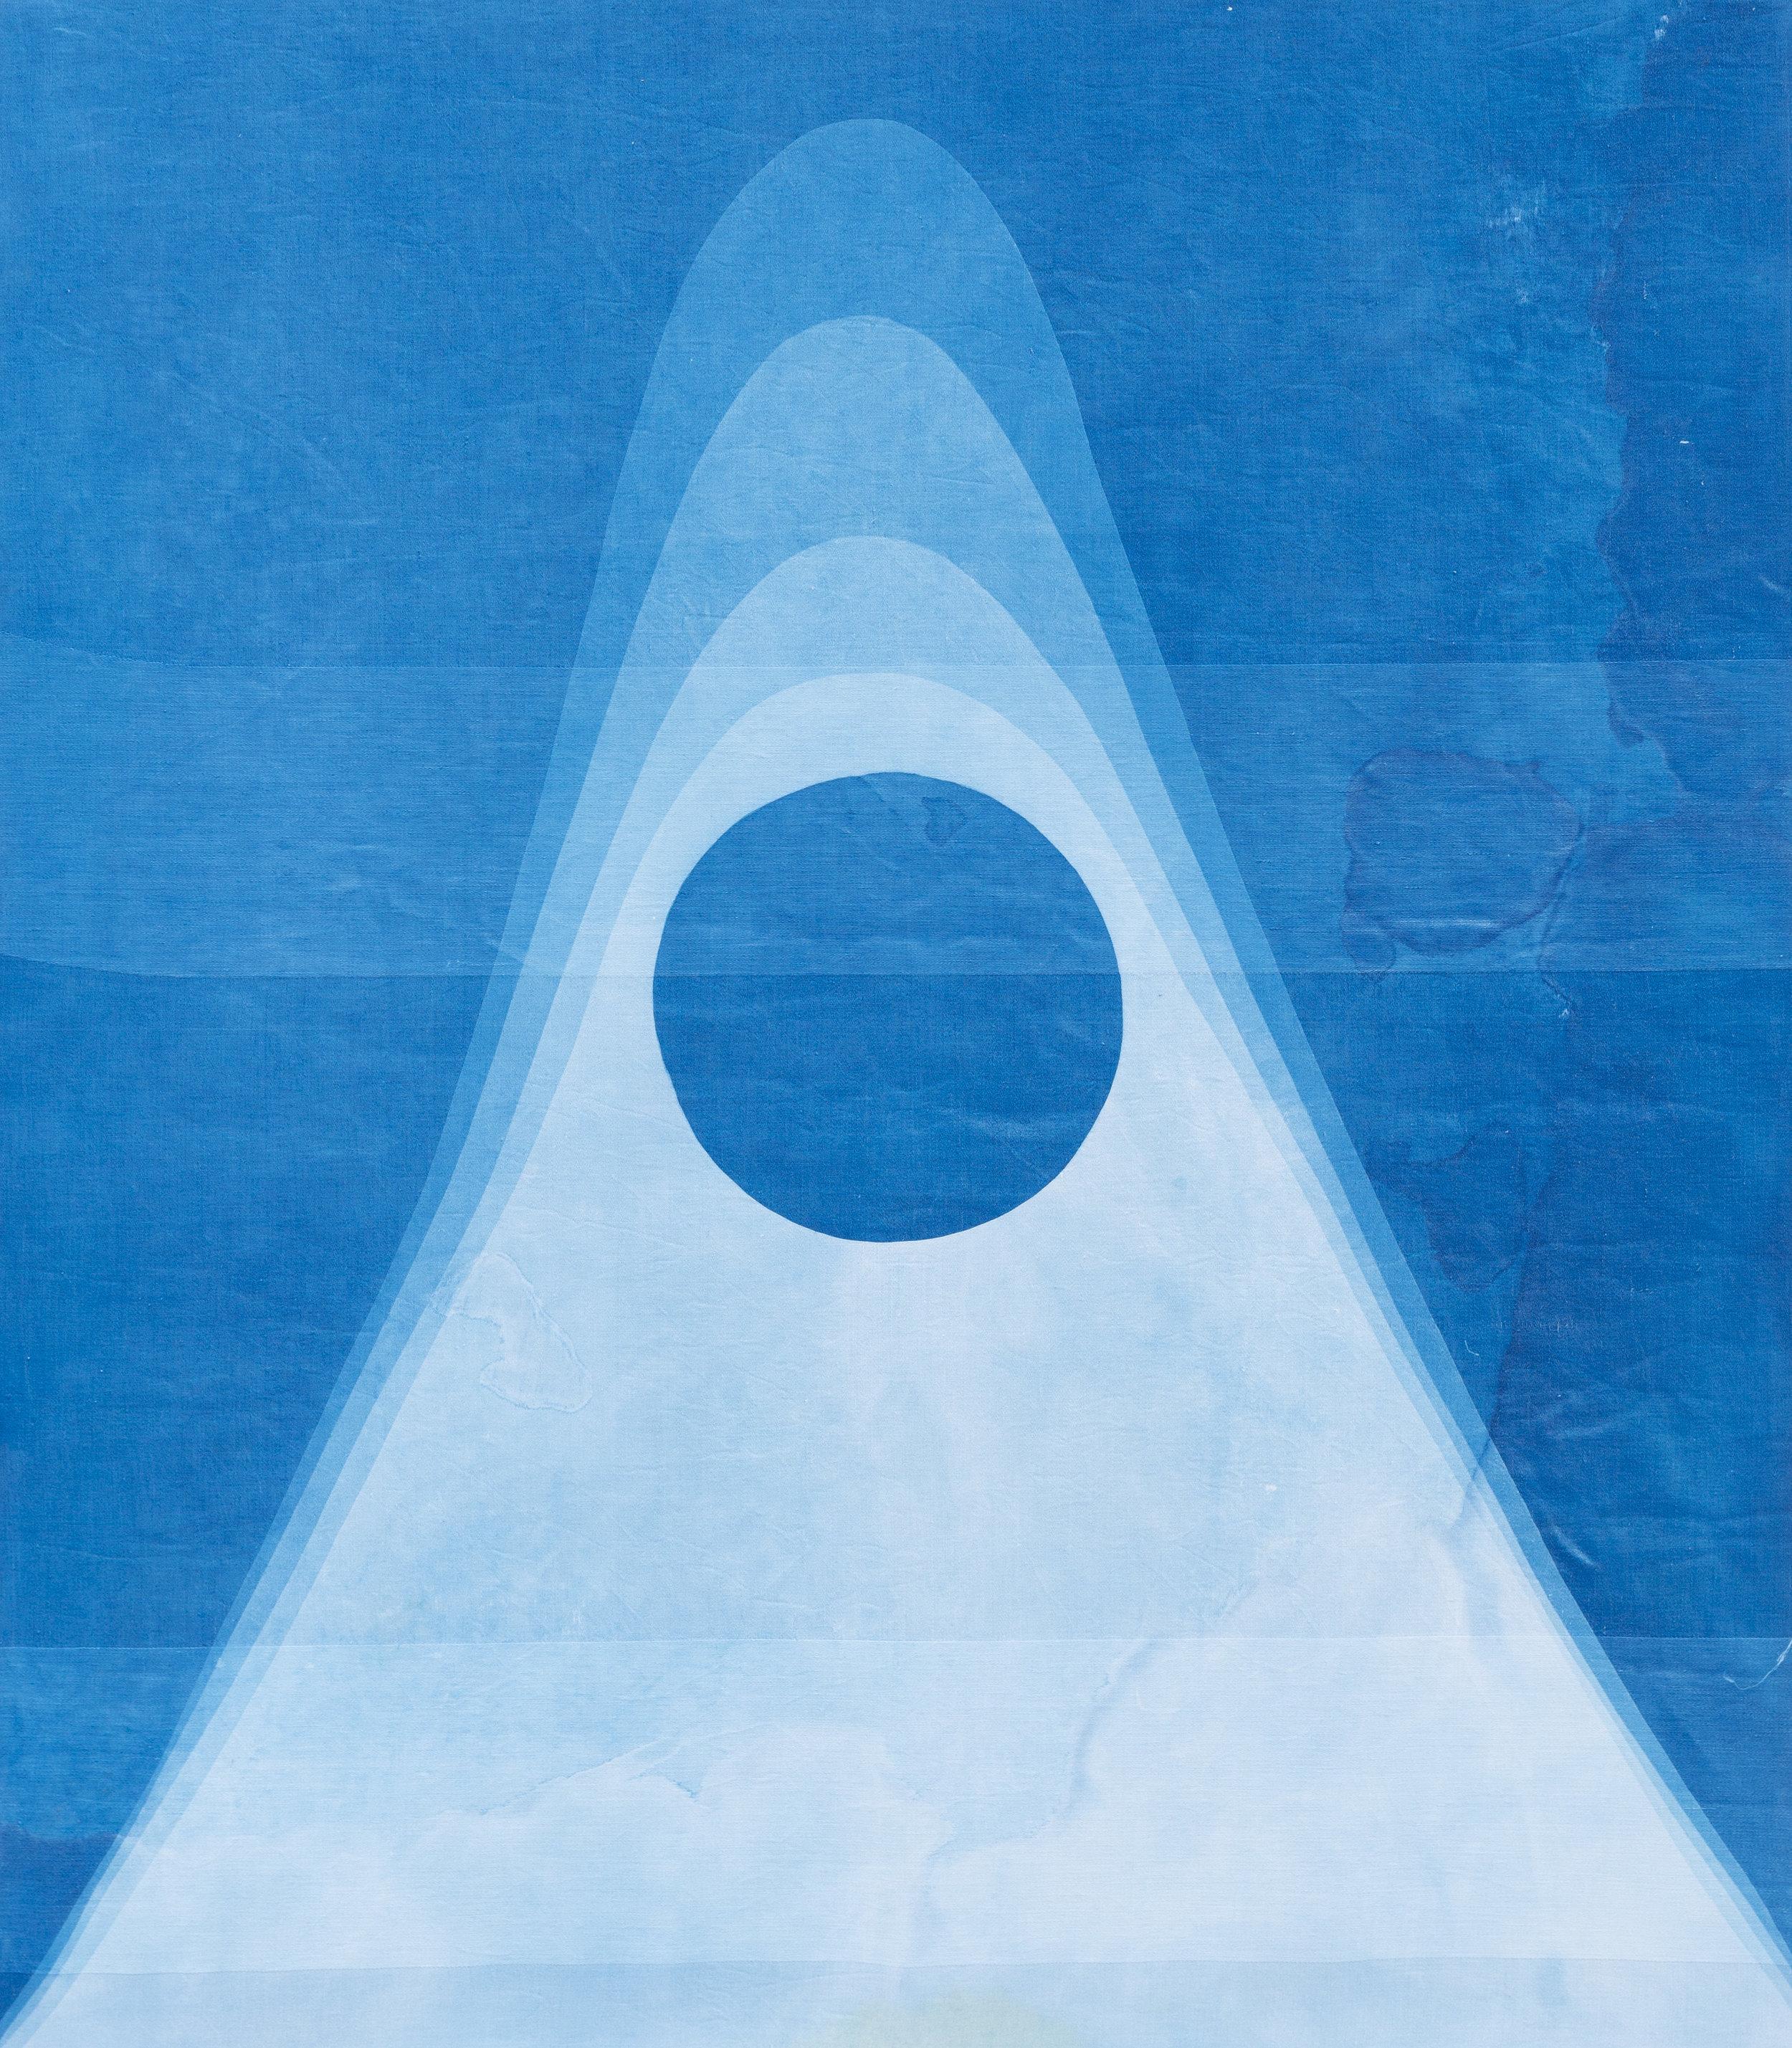 "gravity I, 2019, cyanotype on vintage linen damask stretched on wood frame, 32"" x 28"""